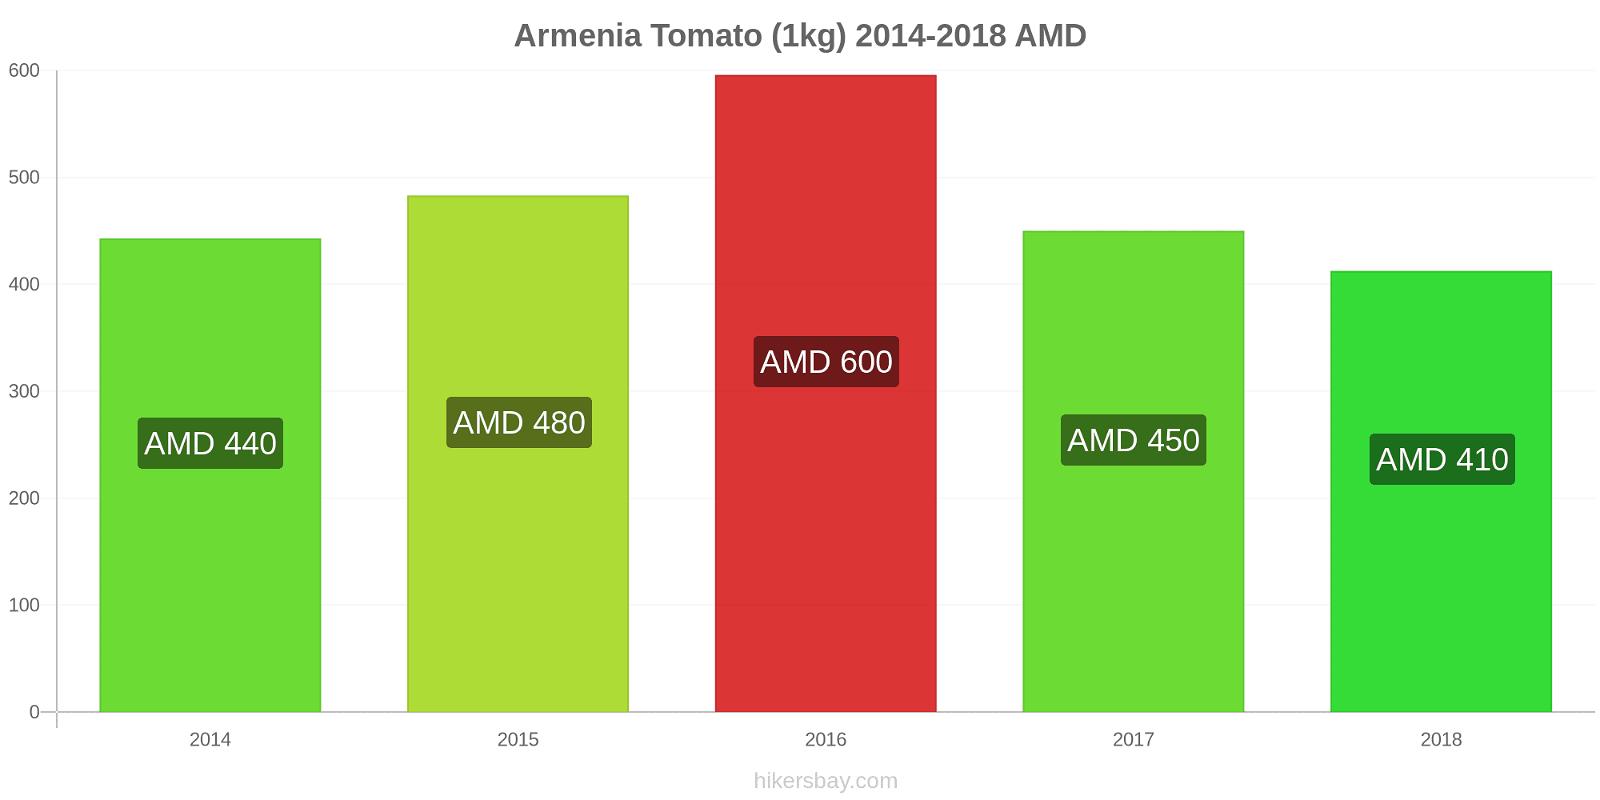 Armenia price changes Tomato (1kg) hikersbay.com